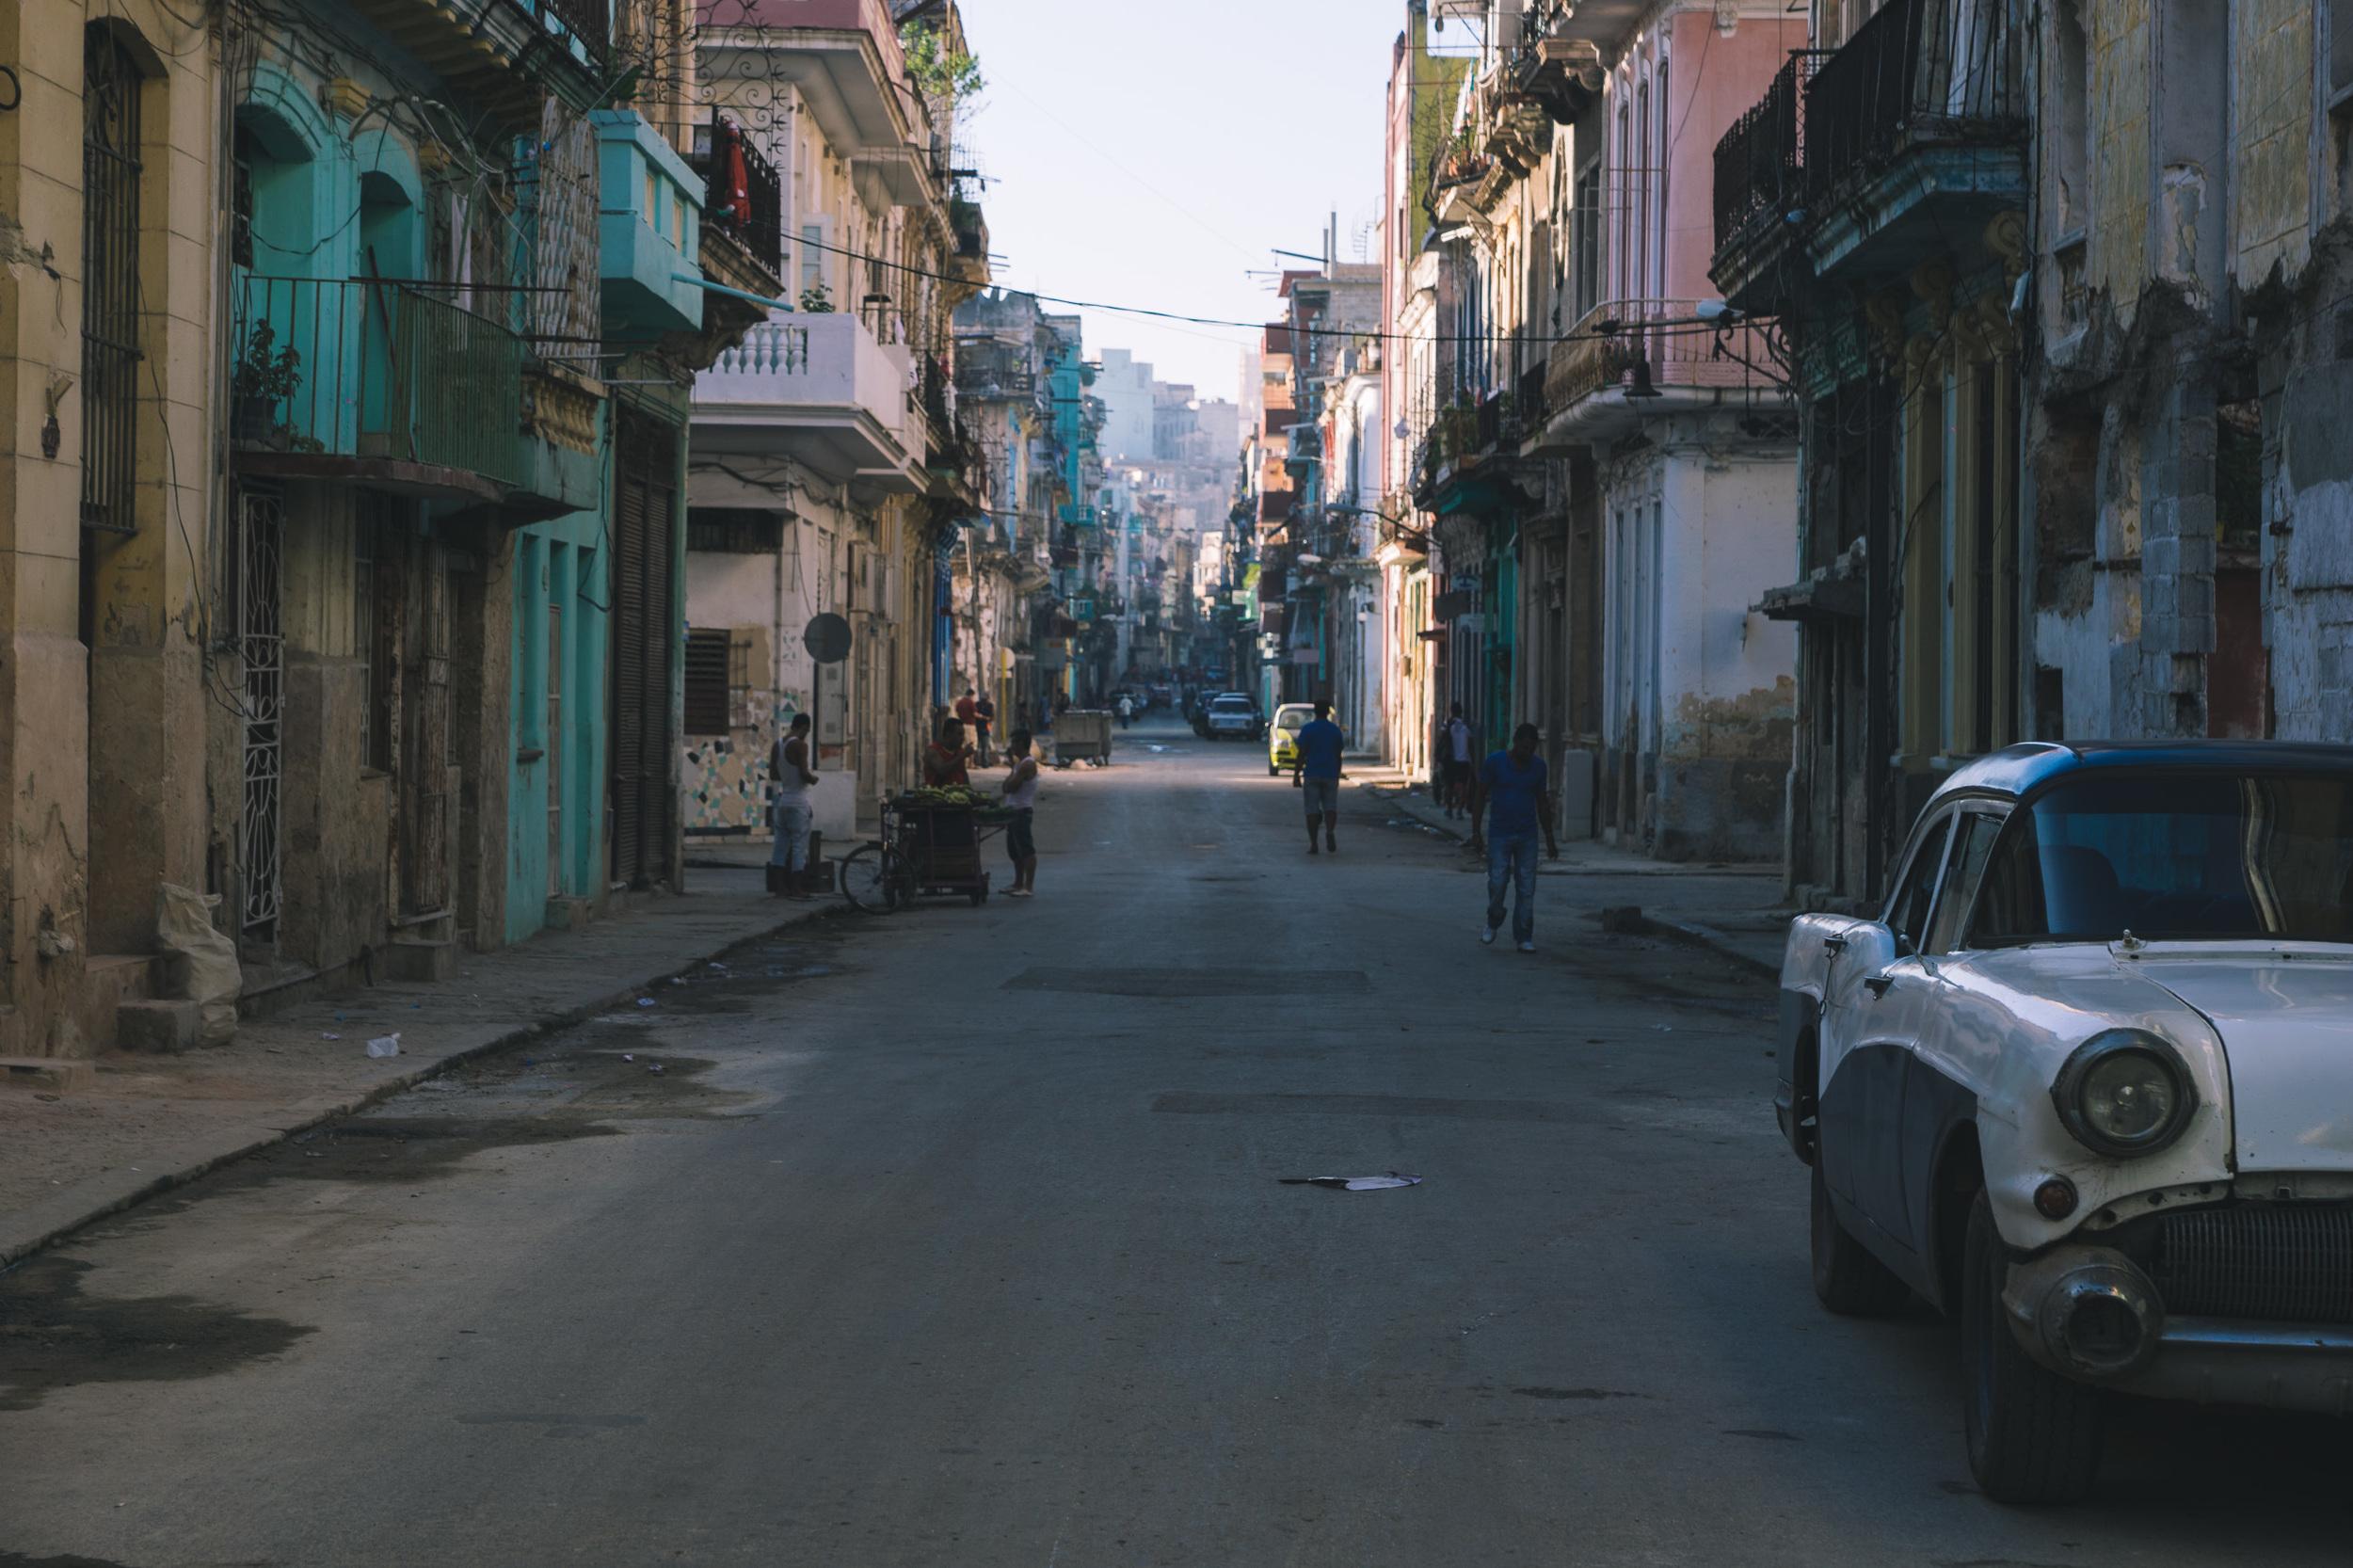 DeClaro-Photography-Cuba-02750.jpg